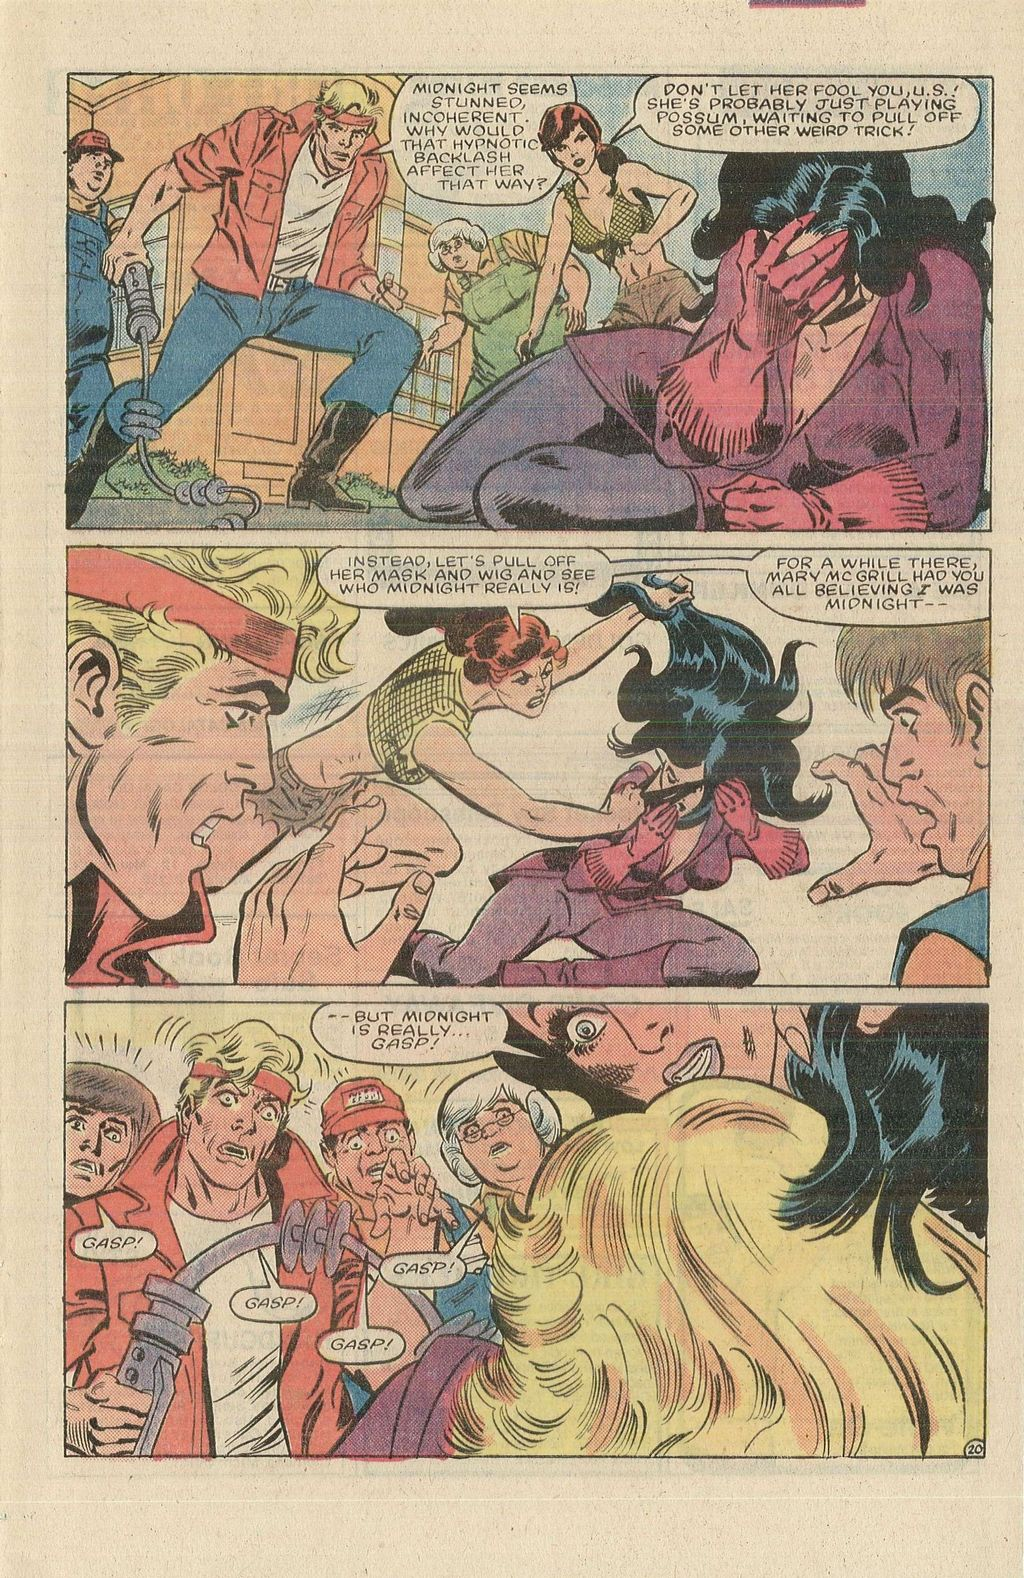 Read online U.S. 1 comic -  Issue #9 - 29